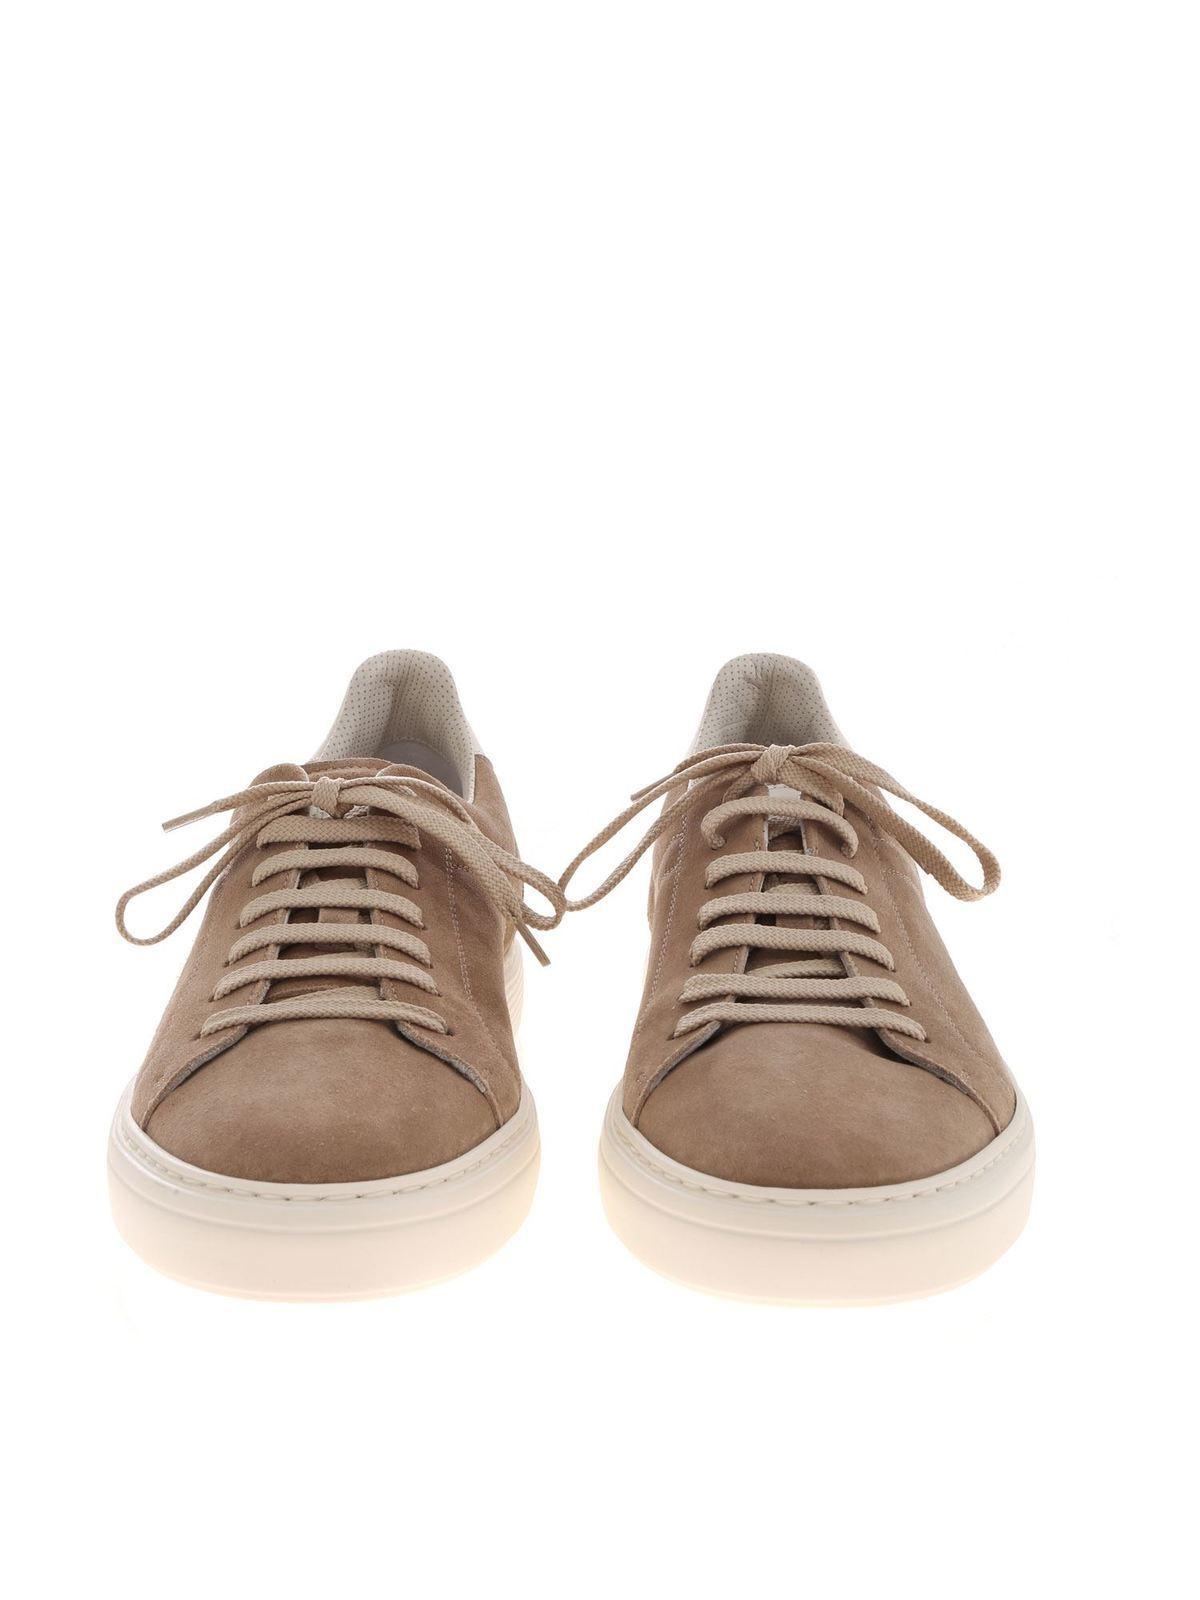 Brunello Cucinelli - Suede sneakers in